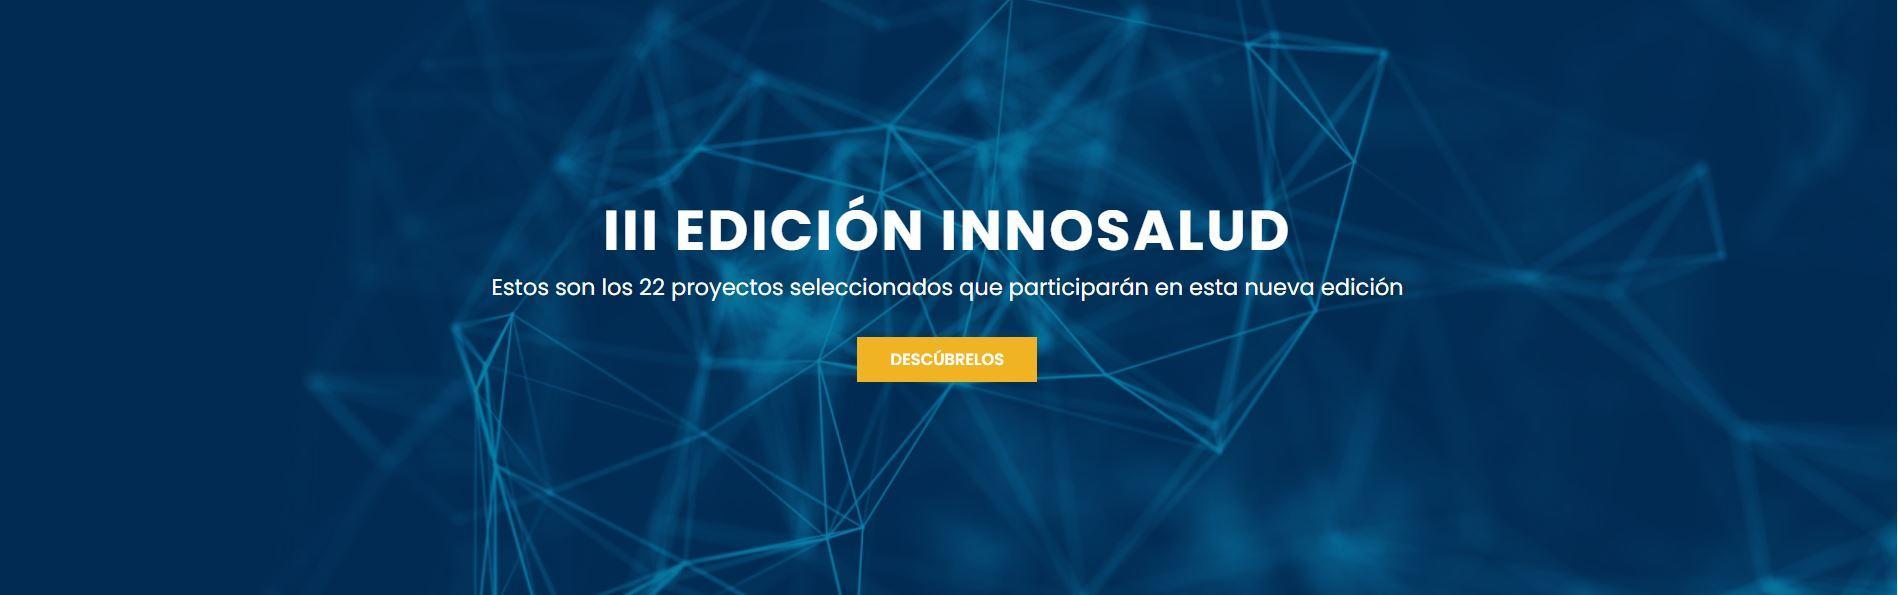 III Edicion INNOSALUD 22 proyectos